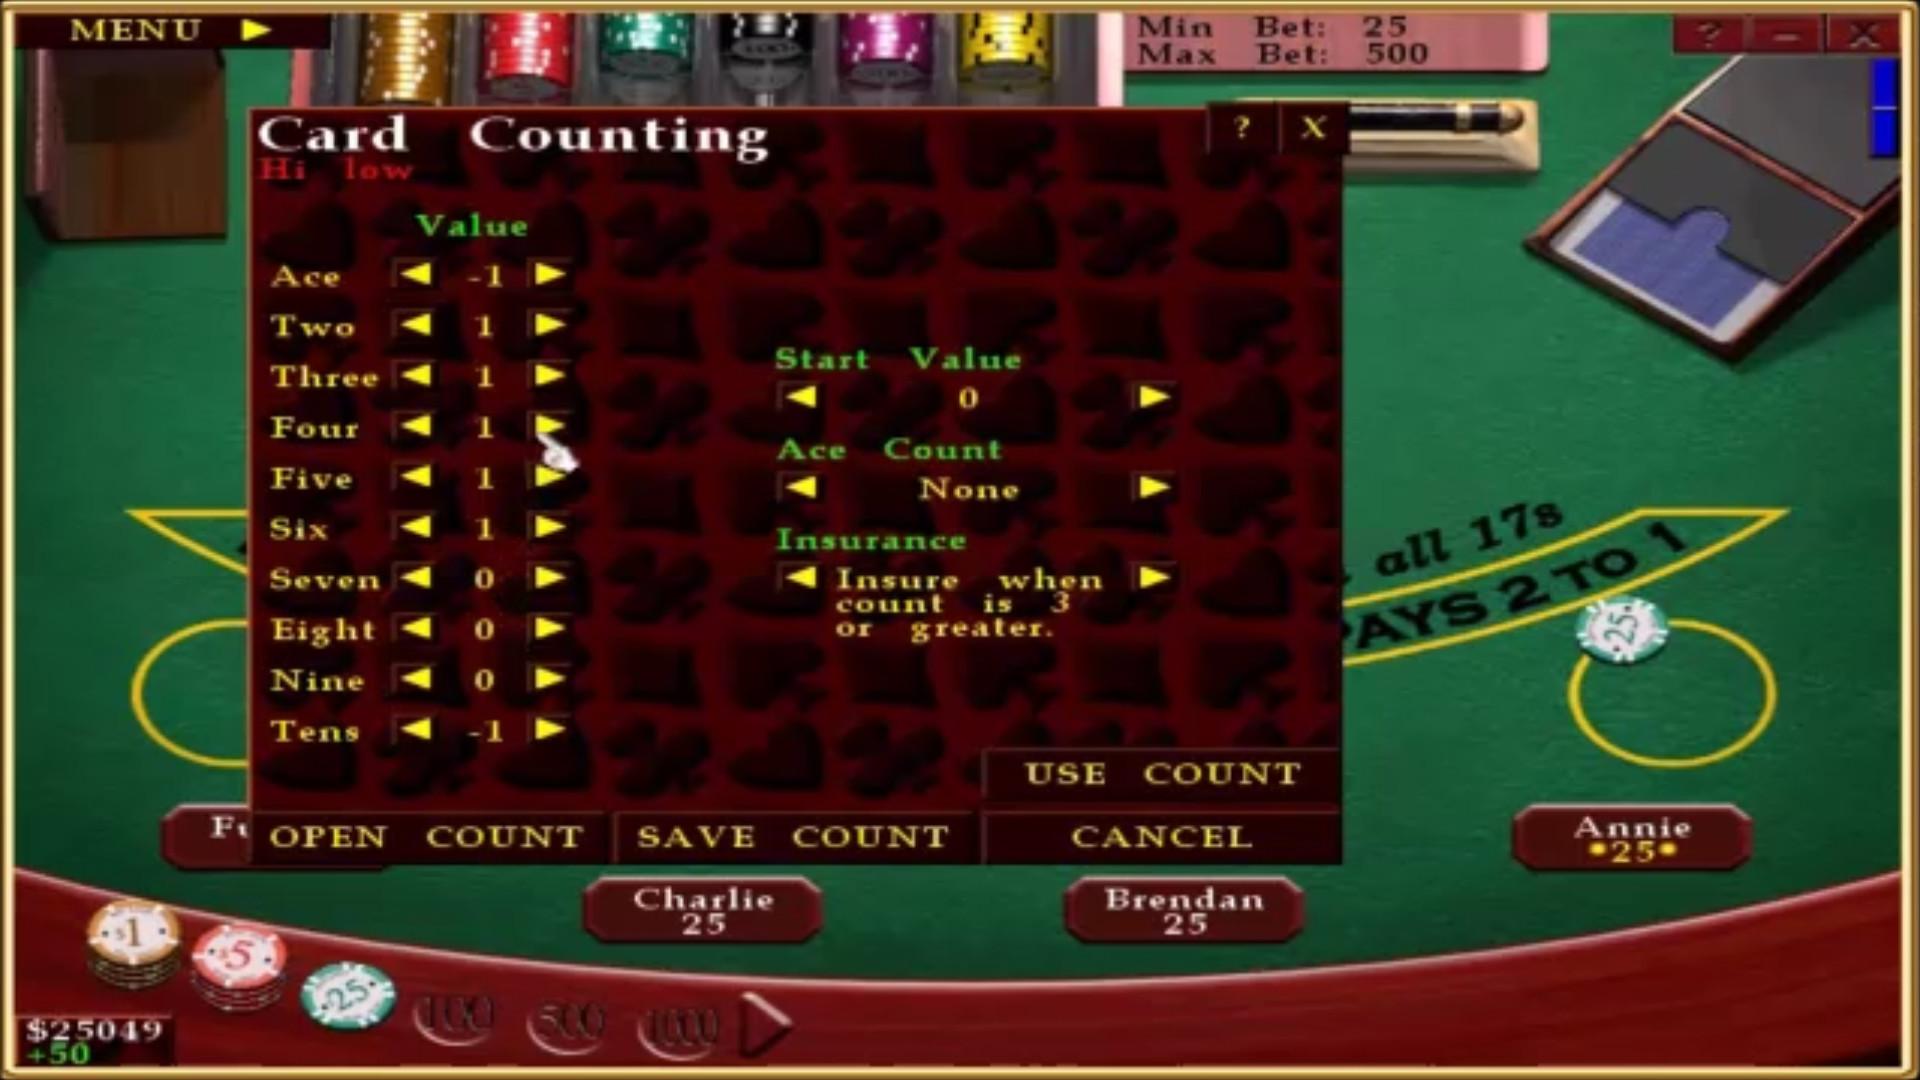 Blackjack counting - 82020